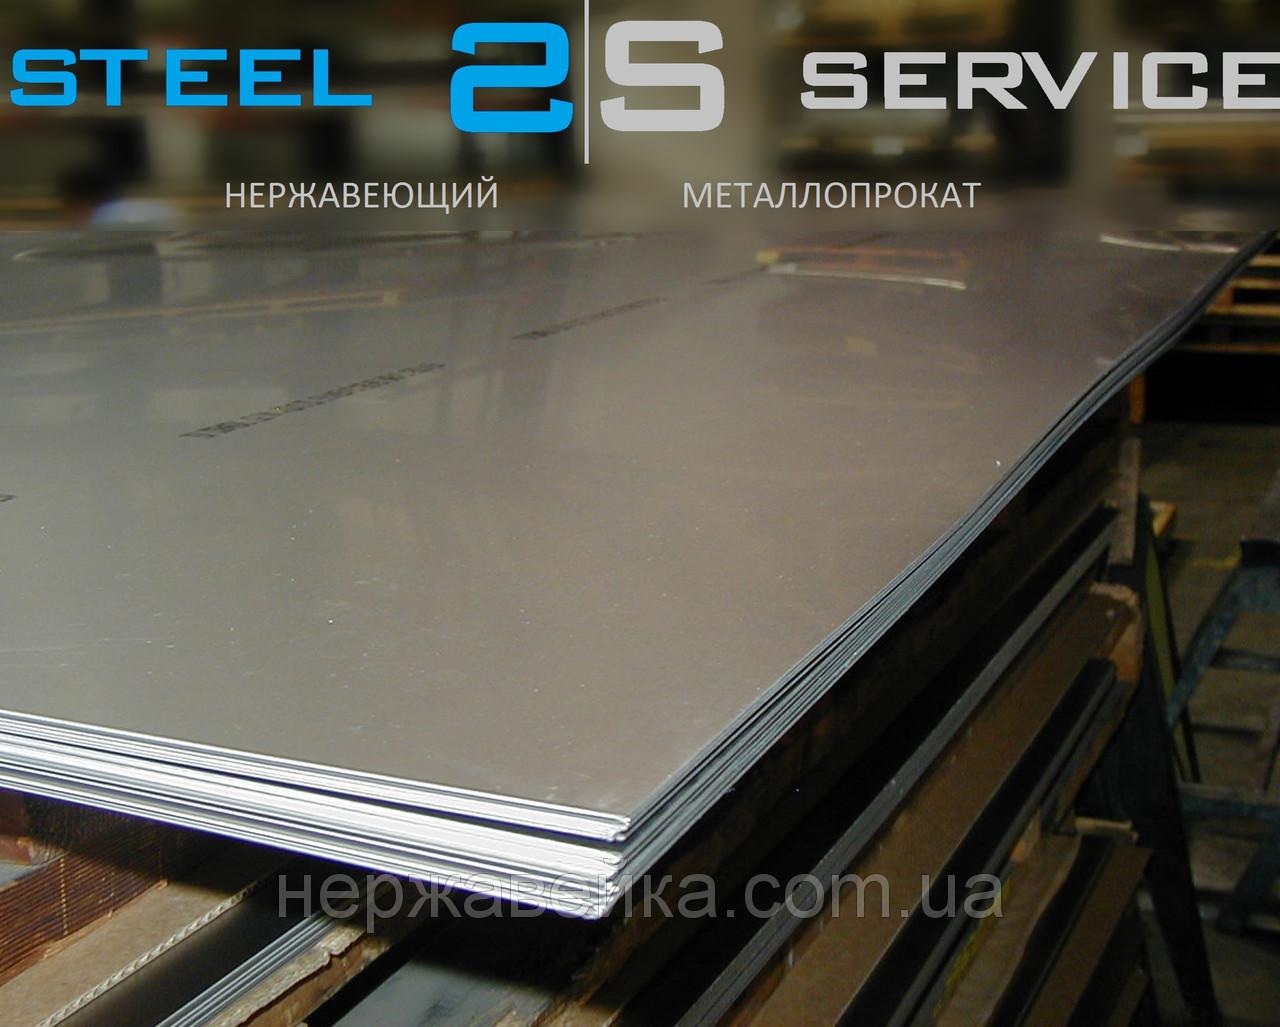 Нержавейка лист 8х1500х6000мм AISI 409(08Х13) F1 - горячекатанный, технический